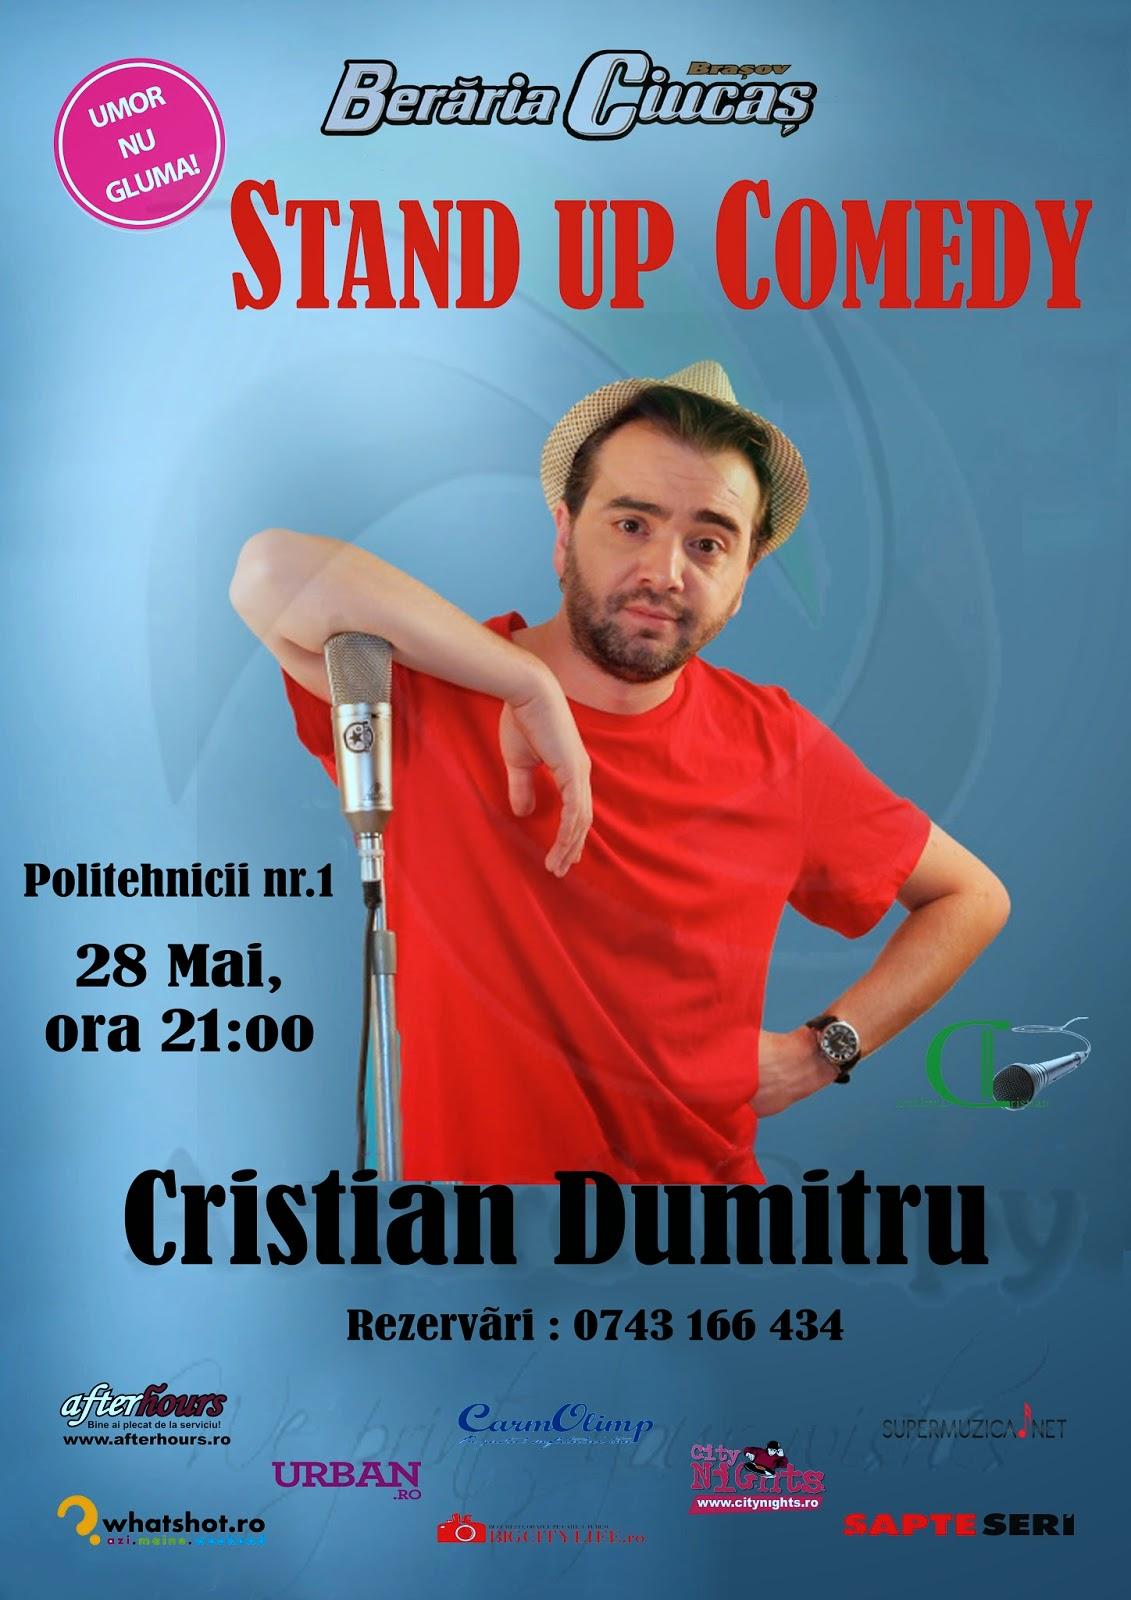 stand-up comedy brasov miercuri beraria ciucas